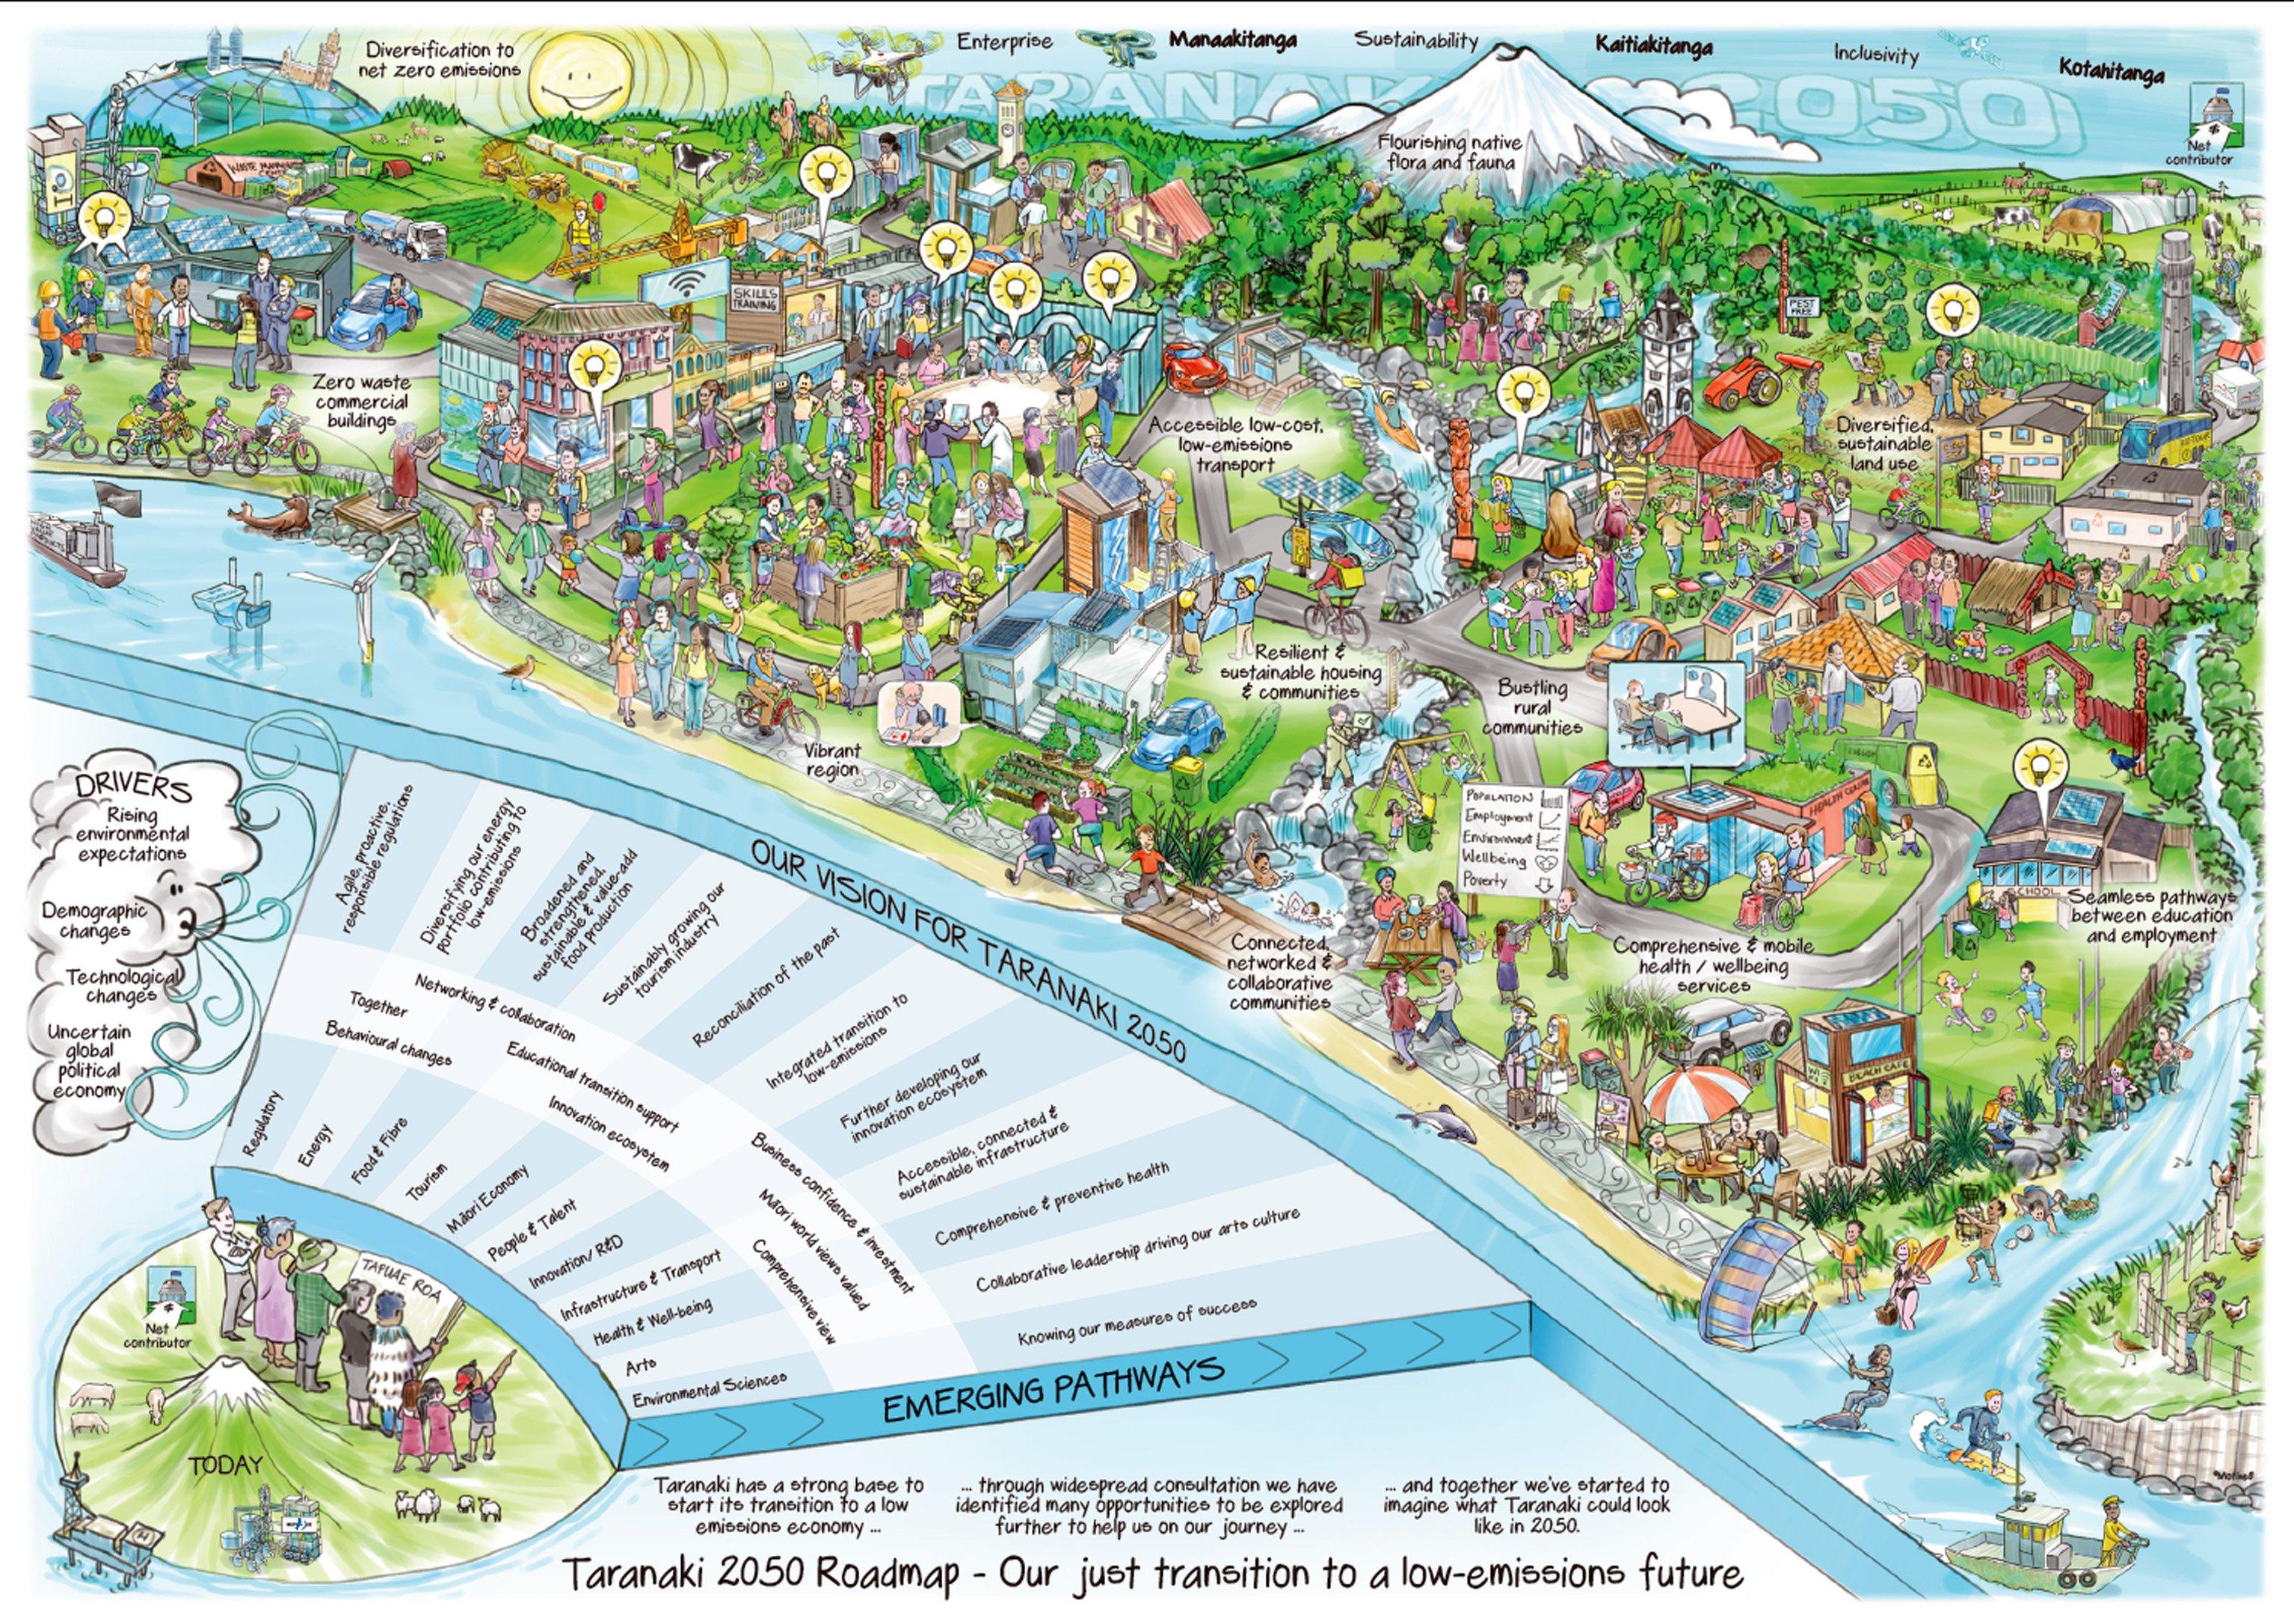 The picture the Taranaki community created for its future.